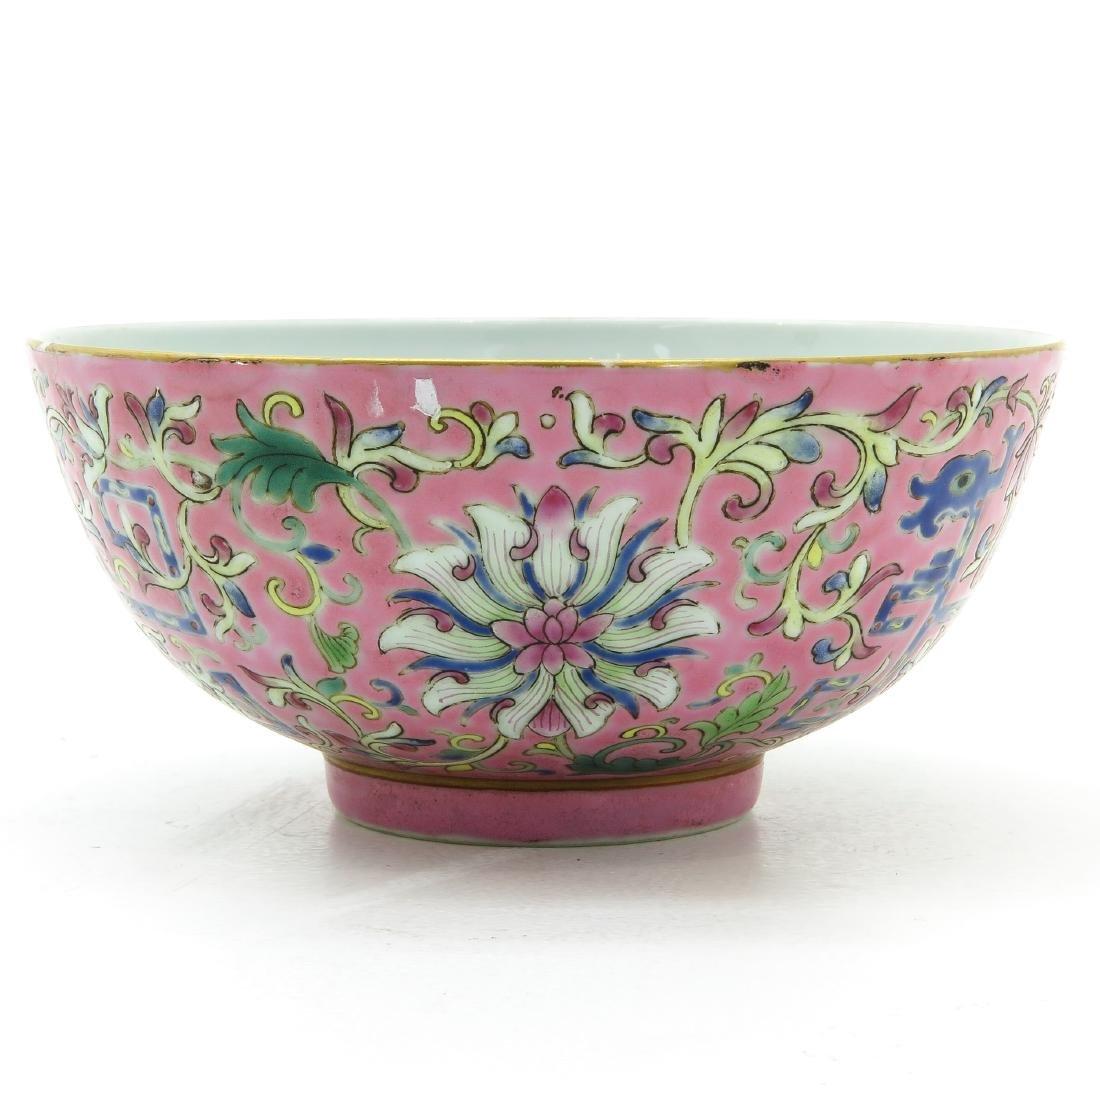 A Famille Rose Decor Bowl